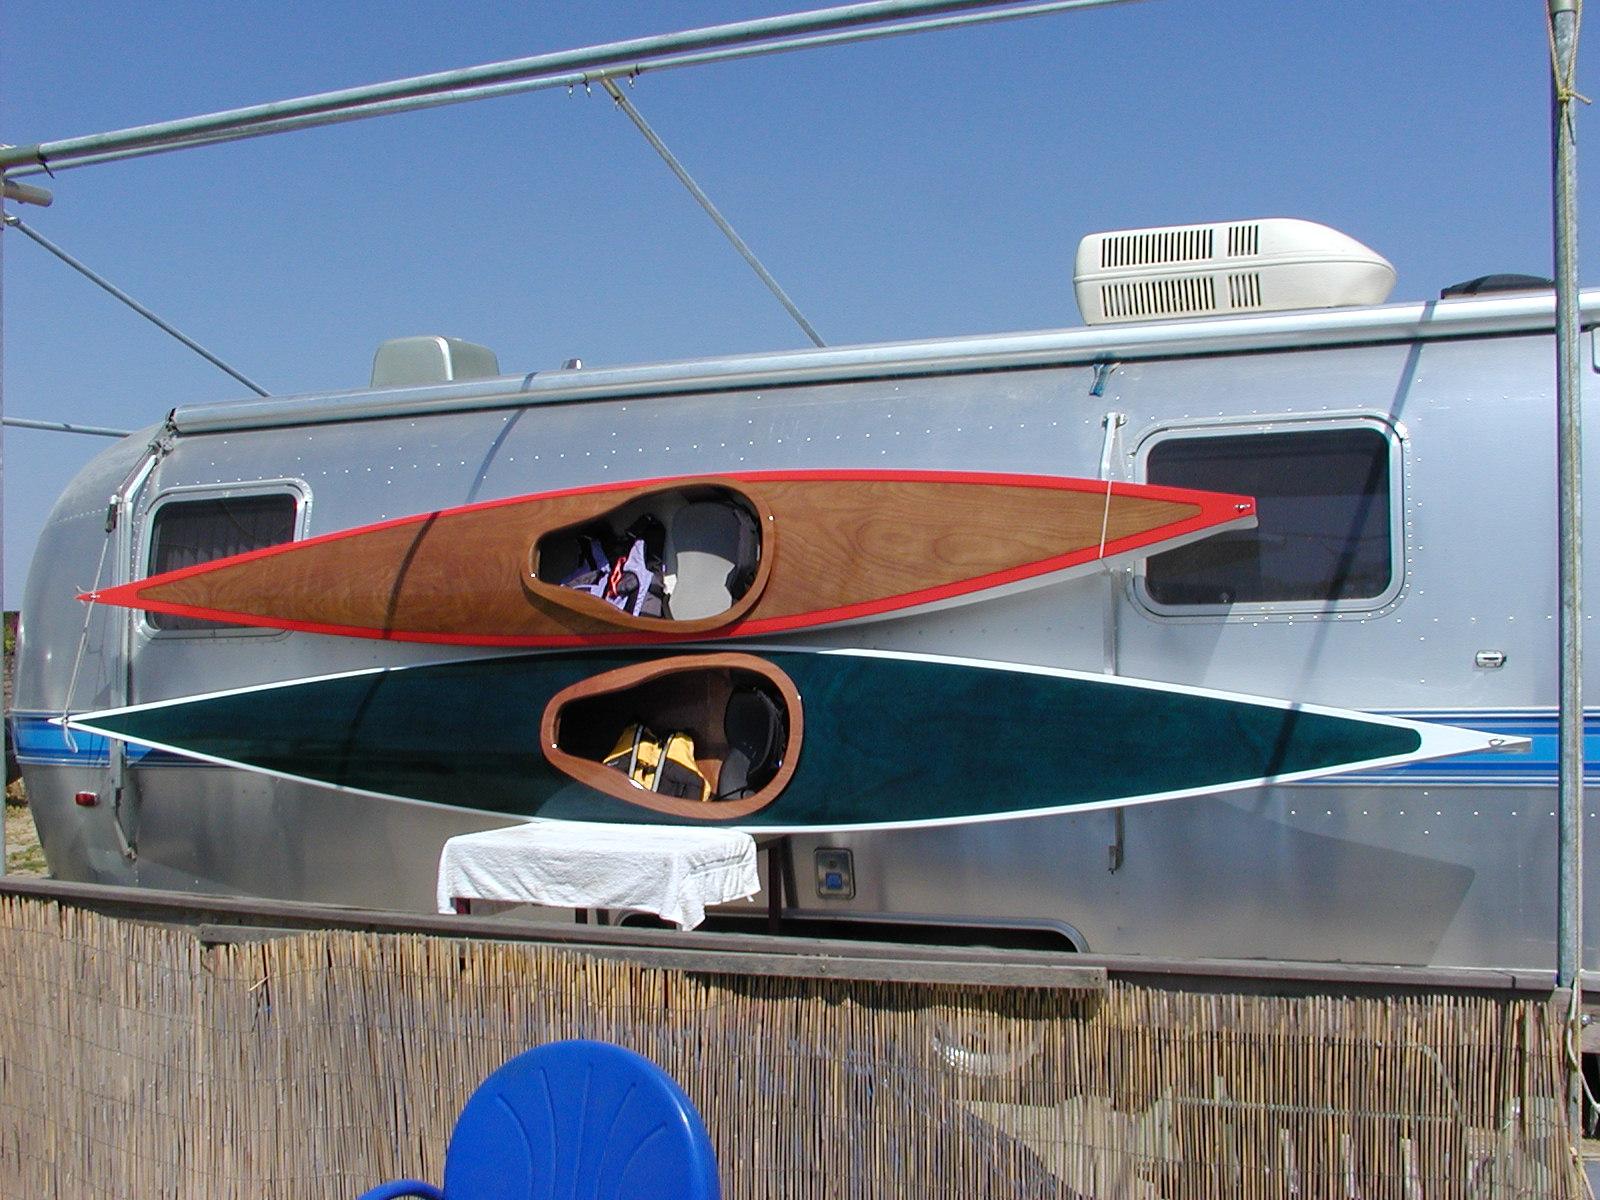 Click image for larger version  Name:Kayak 143.jpg Views:684 Size:416.2 KB ID:58761